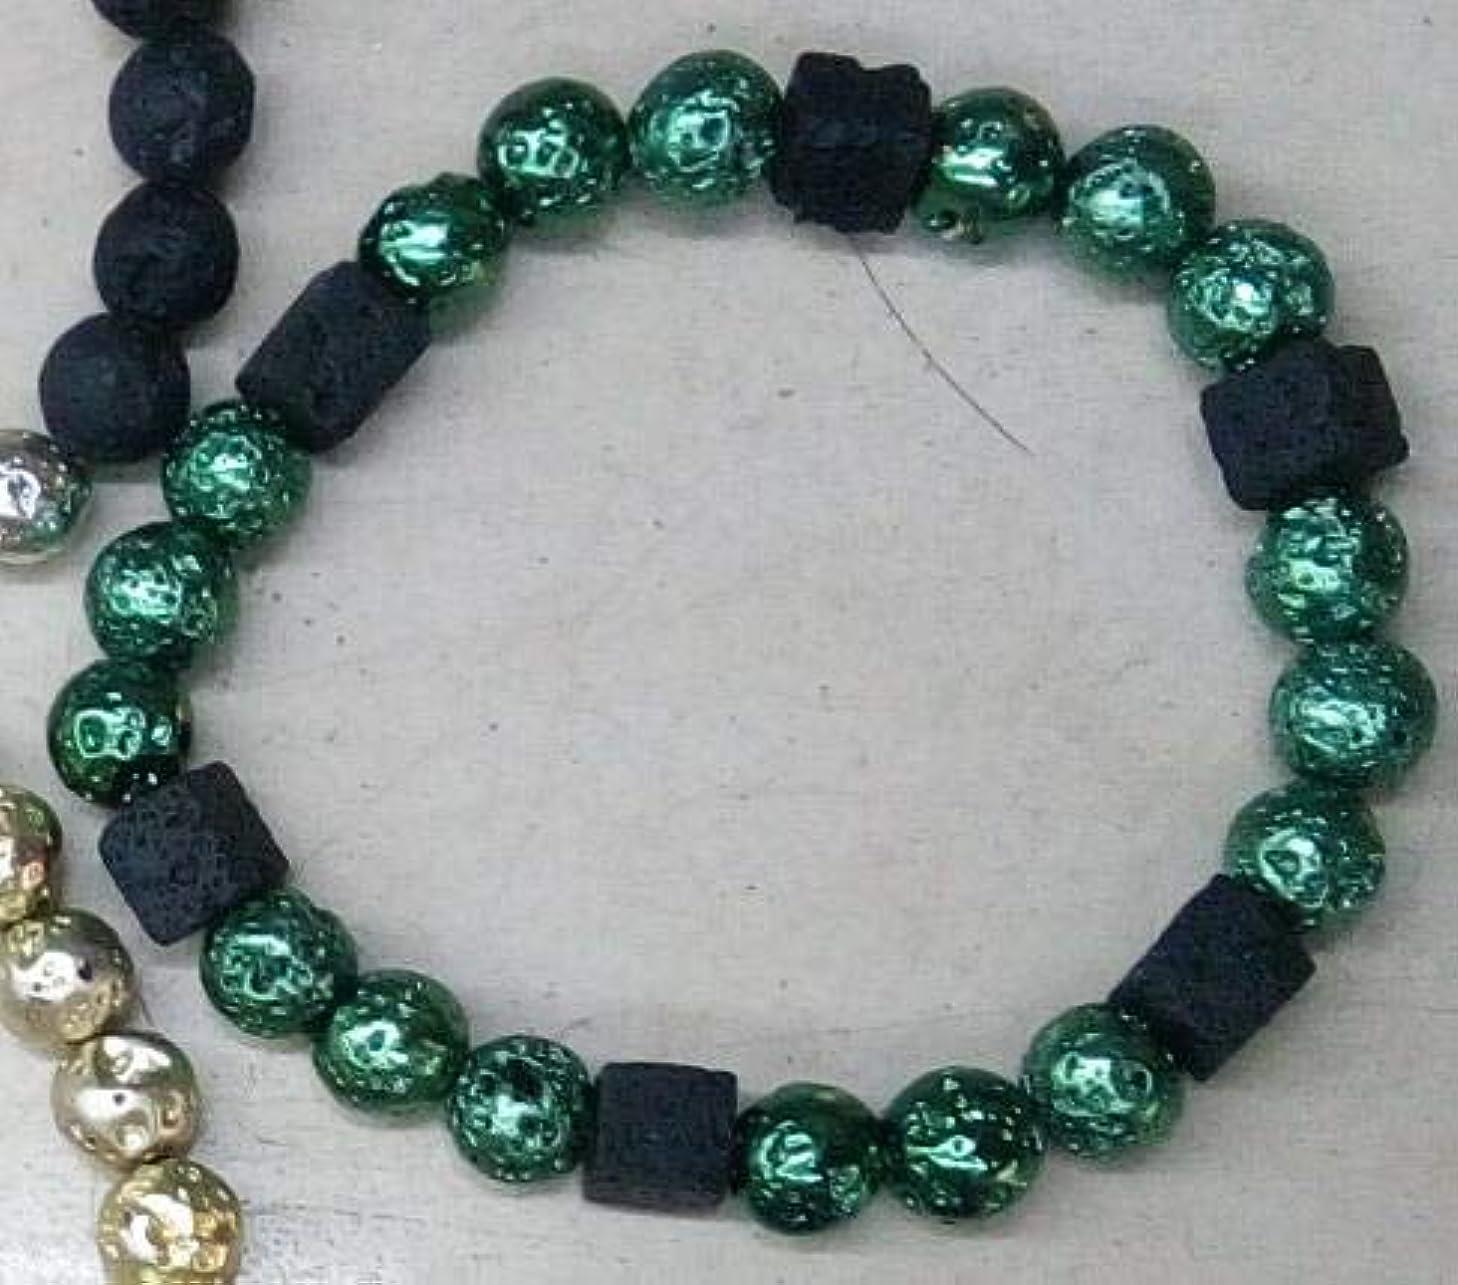 daisy3010 Necklace for Women - Gold Silver Volcanic Stone 7 Chakra Bracelet Men Black Lava Healing Balance Bead Reiki Buddha Prayer Natural Stone Yoga Bracelet - Green Color